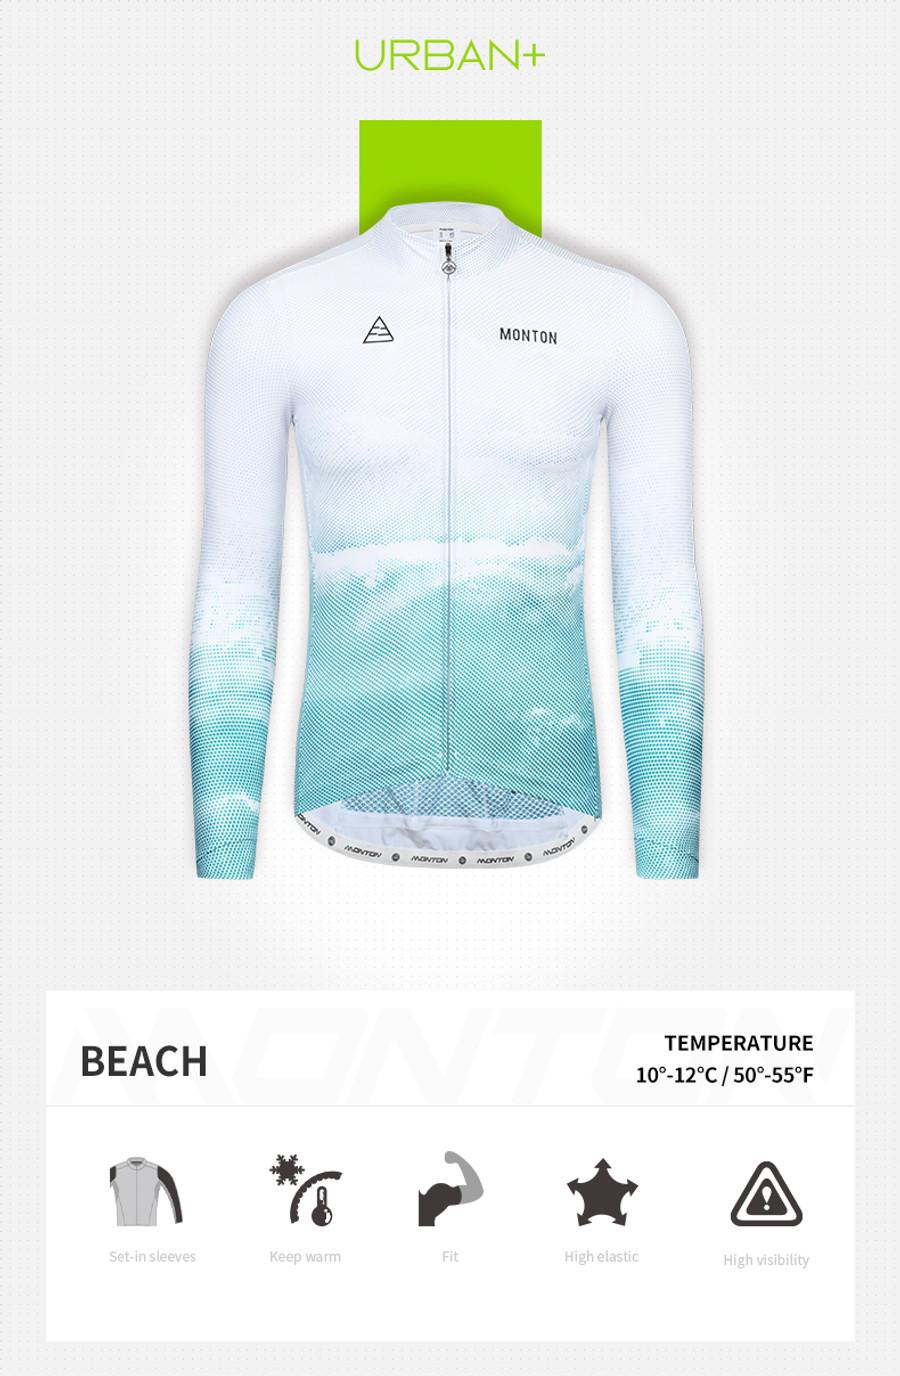 Men's Urban+ Beach Thermal l/s Jersey